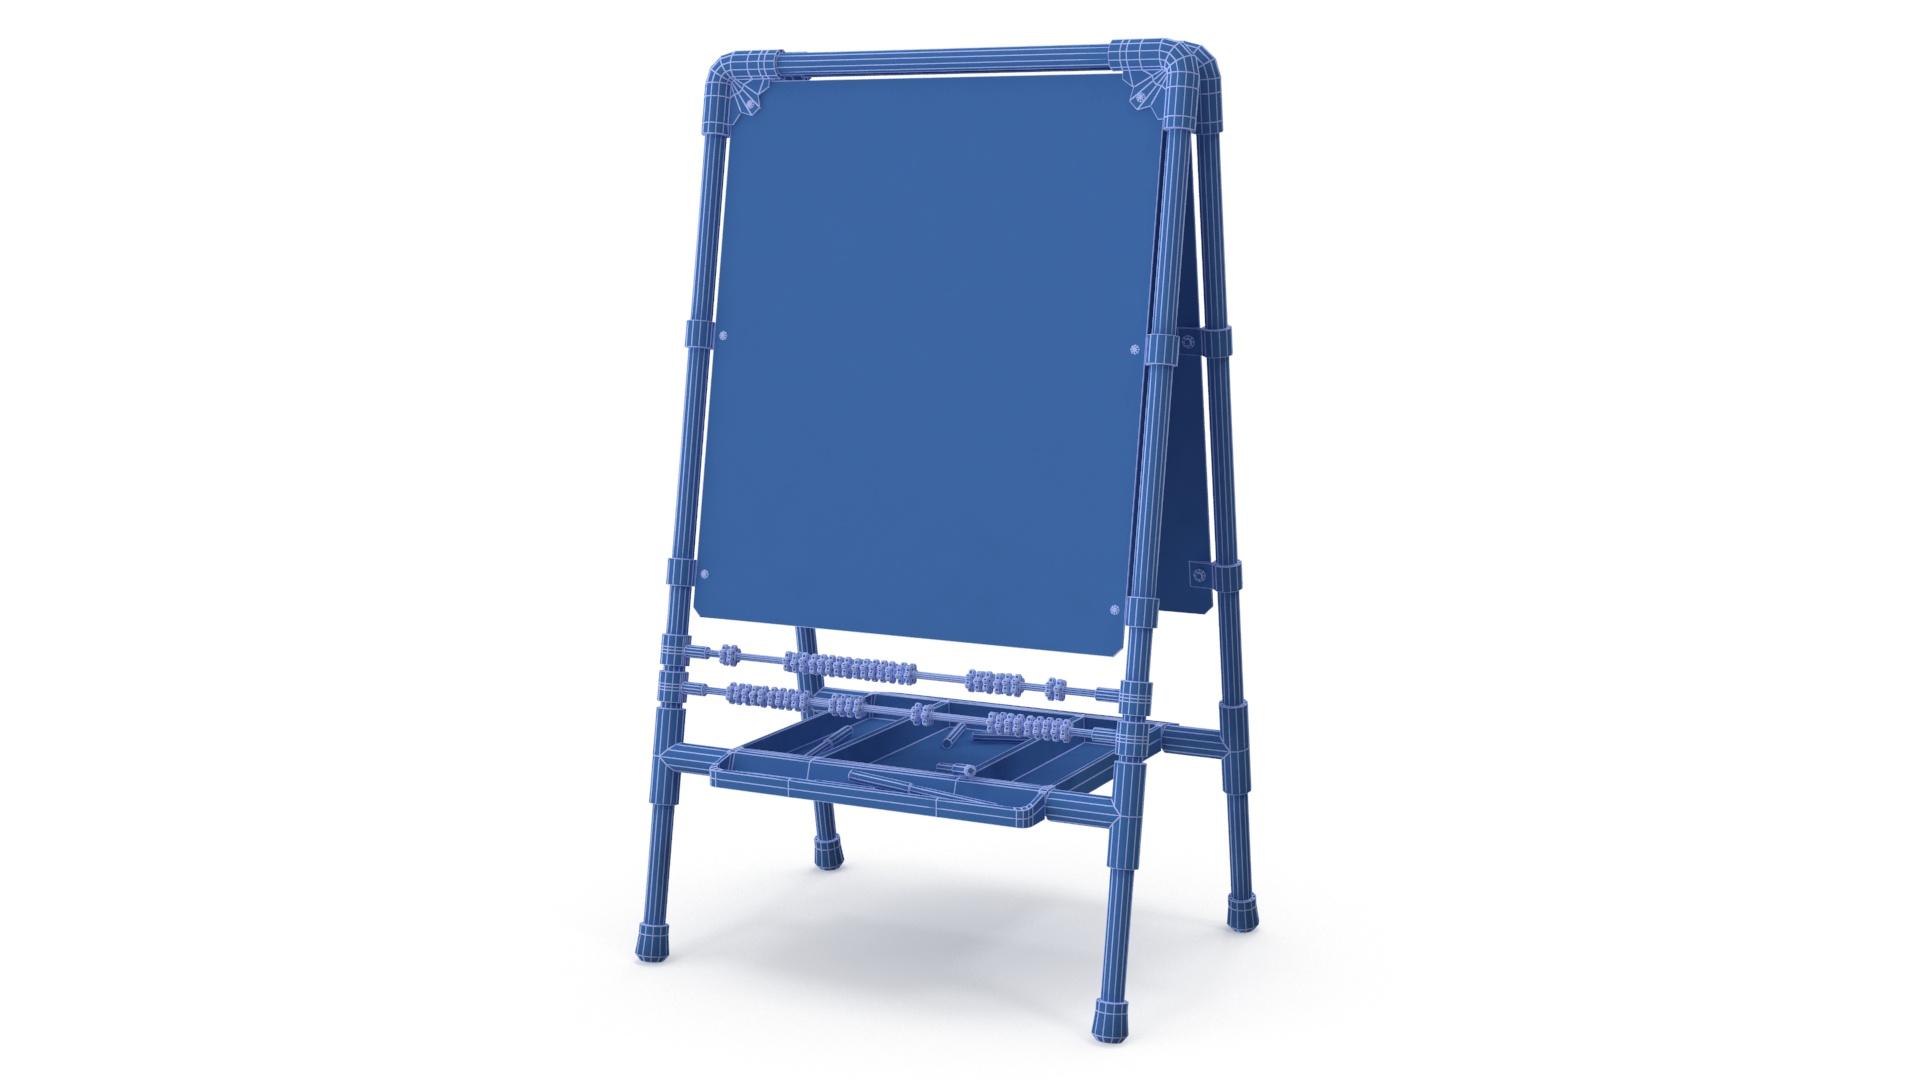 childrens drawing board 3d model 3ds max fbx obj 263607